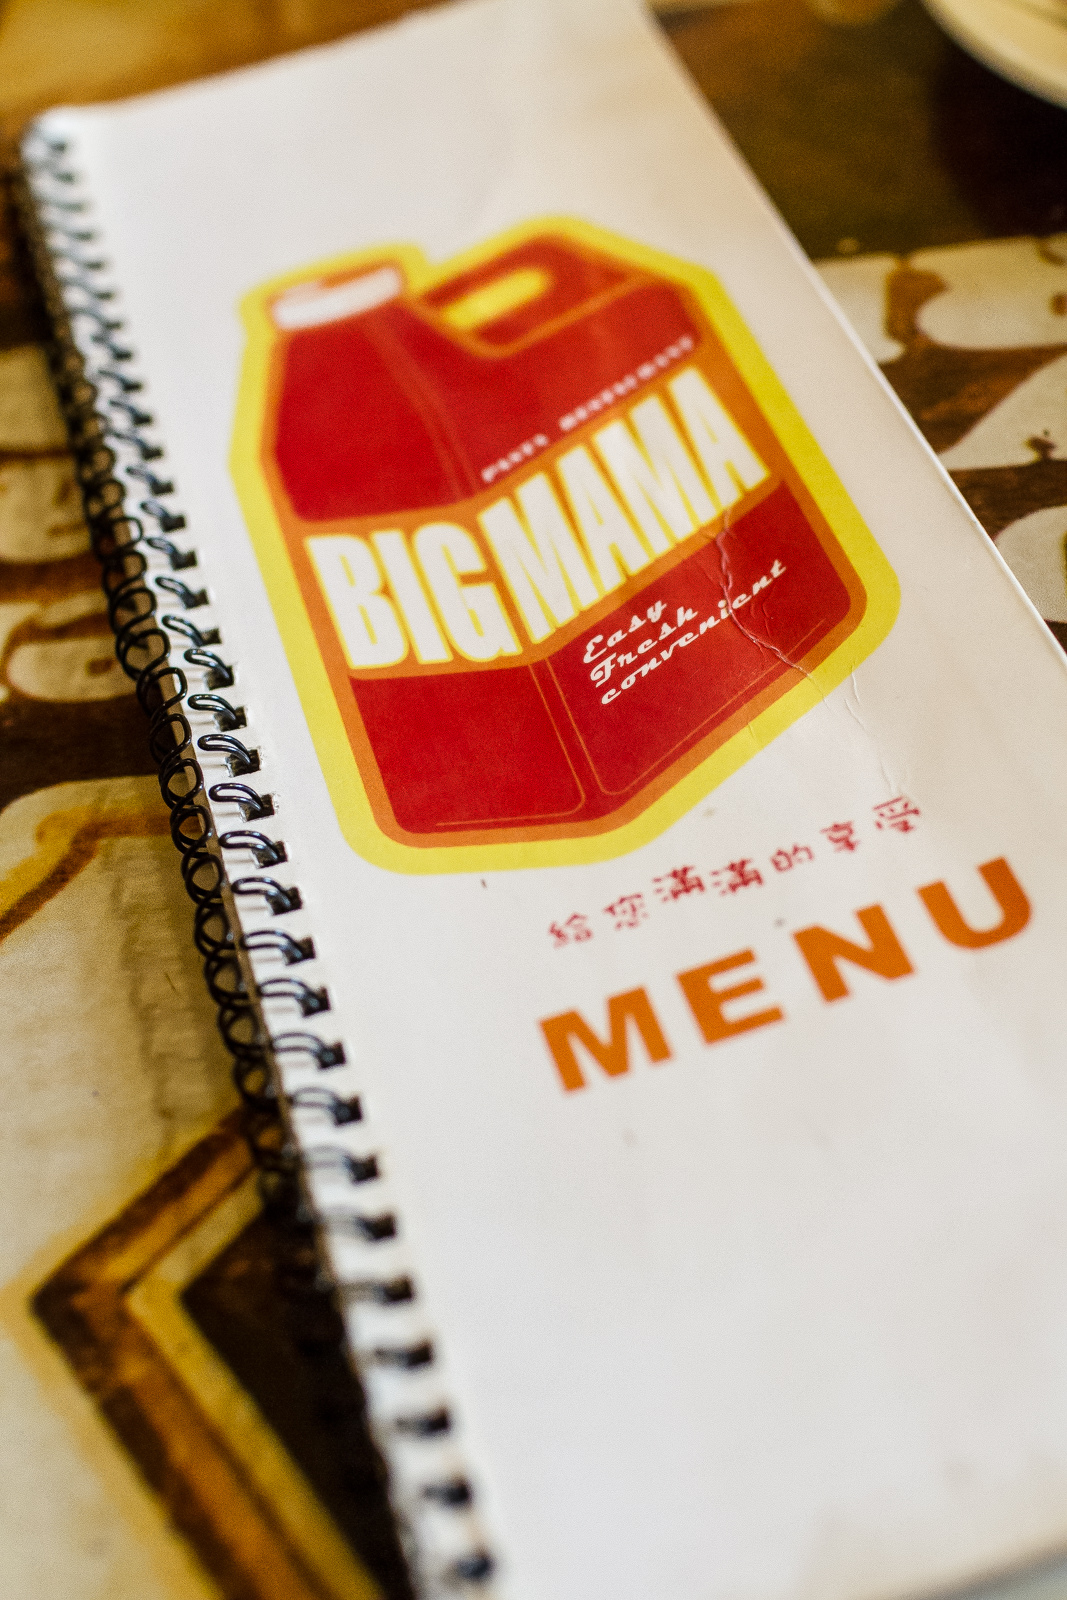 Big MaMa義大利餐廳-菜單